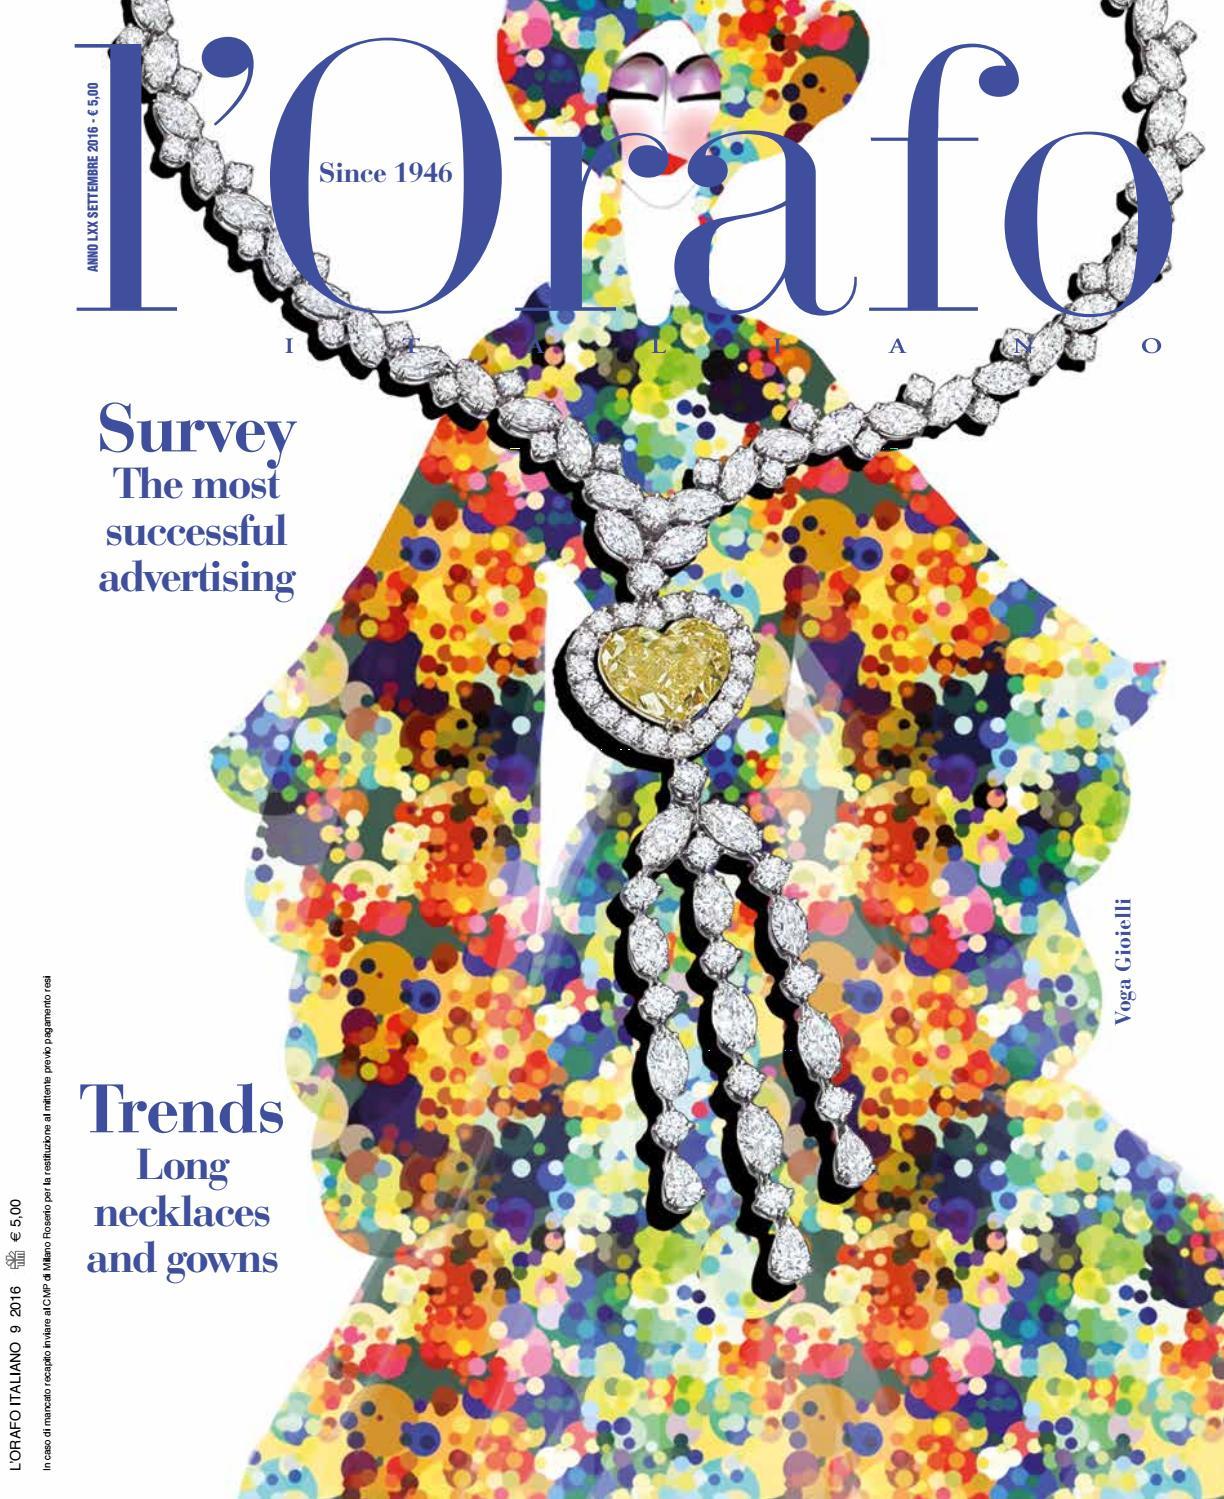 l Orafo Italiano 09 2016 by Edifis - issuu d3d00c48f7c